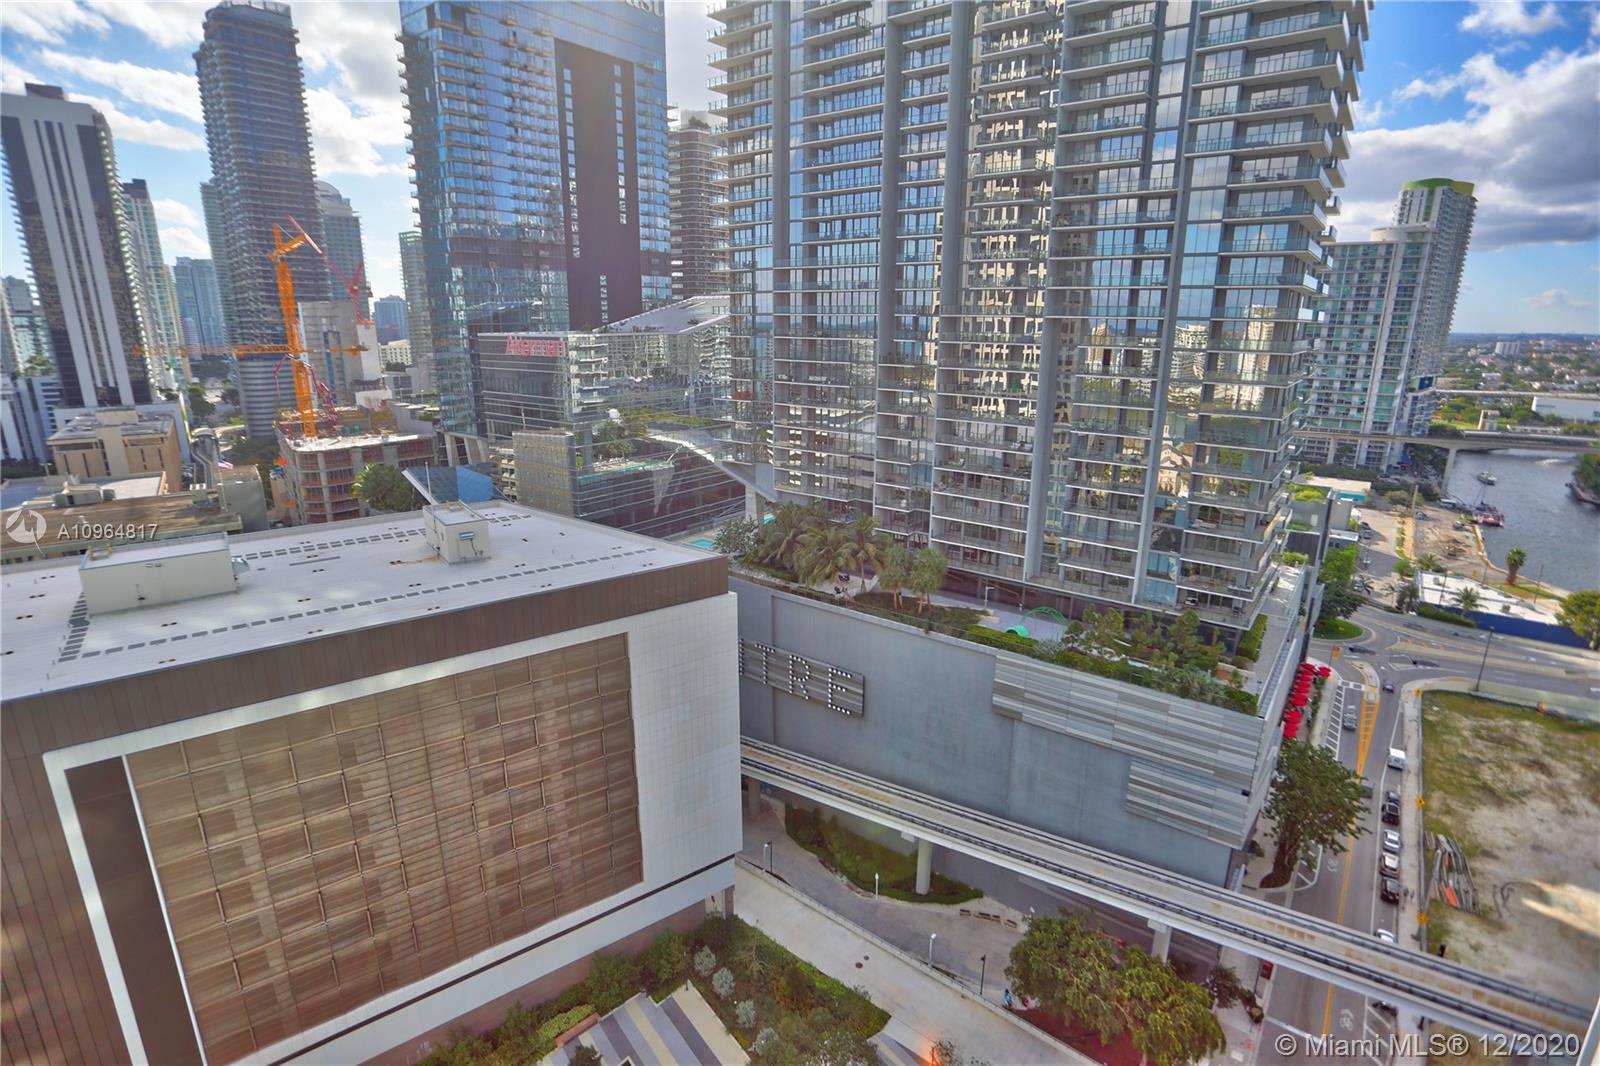 500 Brickell East Tower #2304 - 55 SE 6th St #2304, Miami, FL 33131